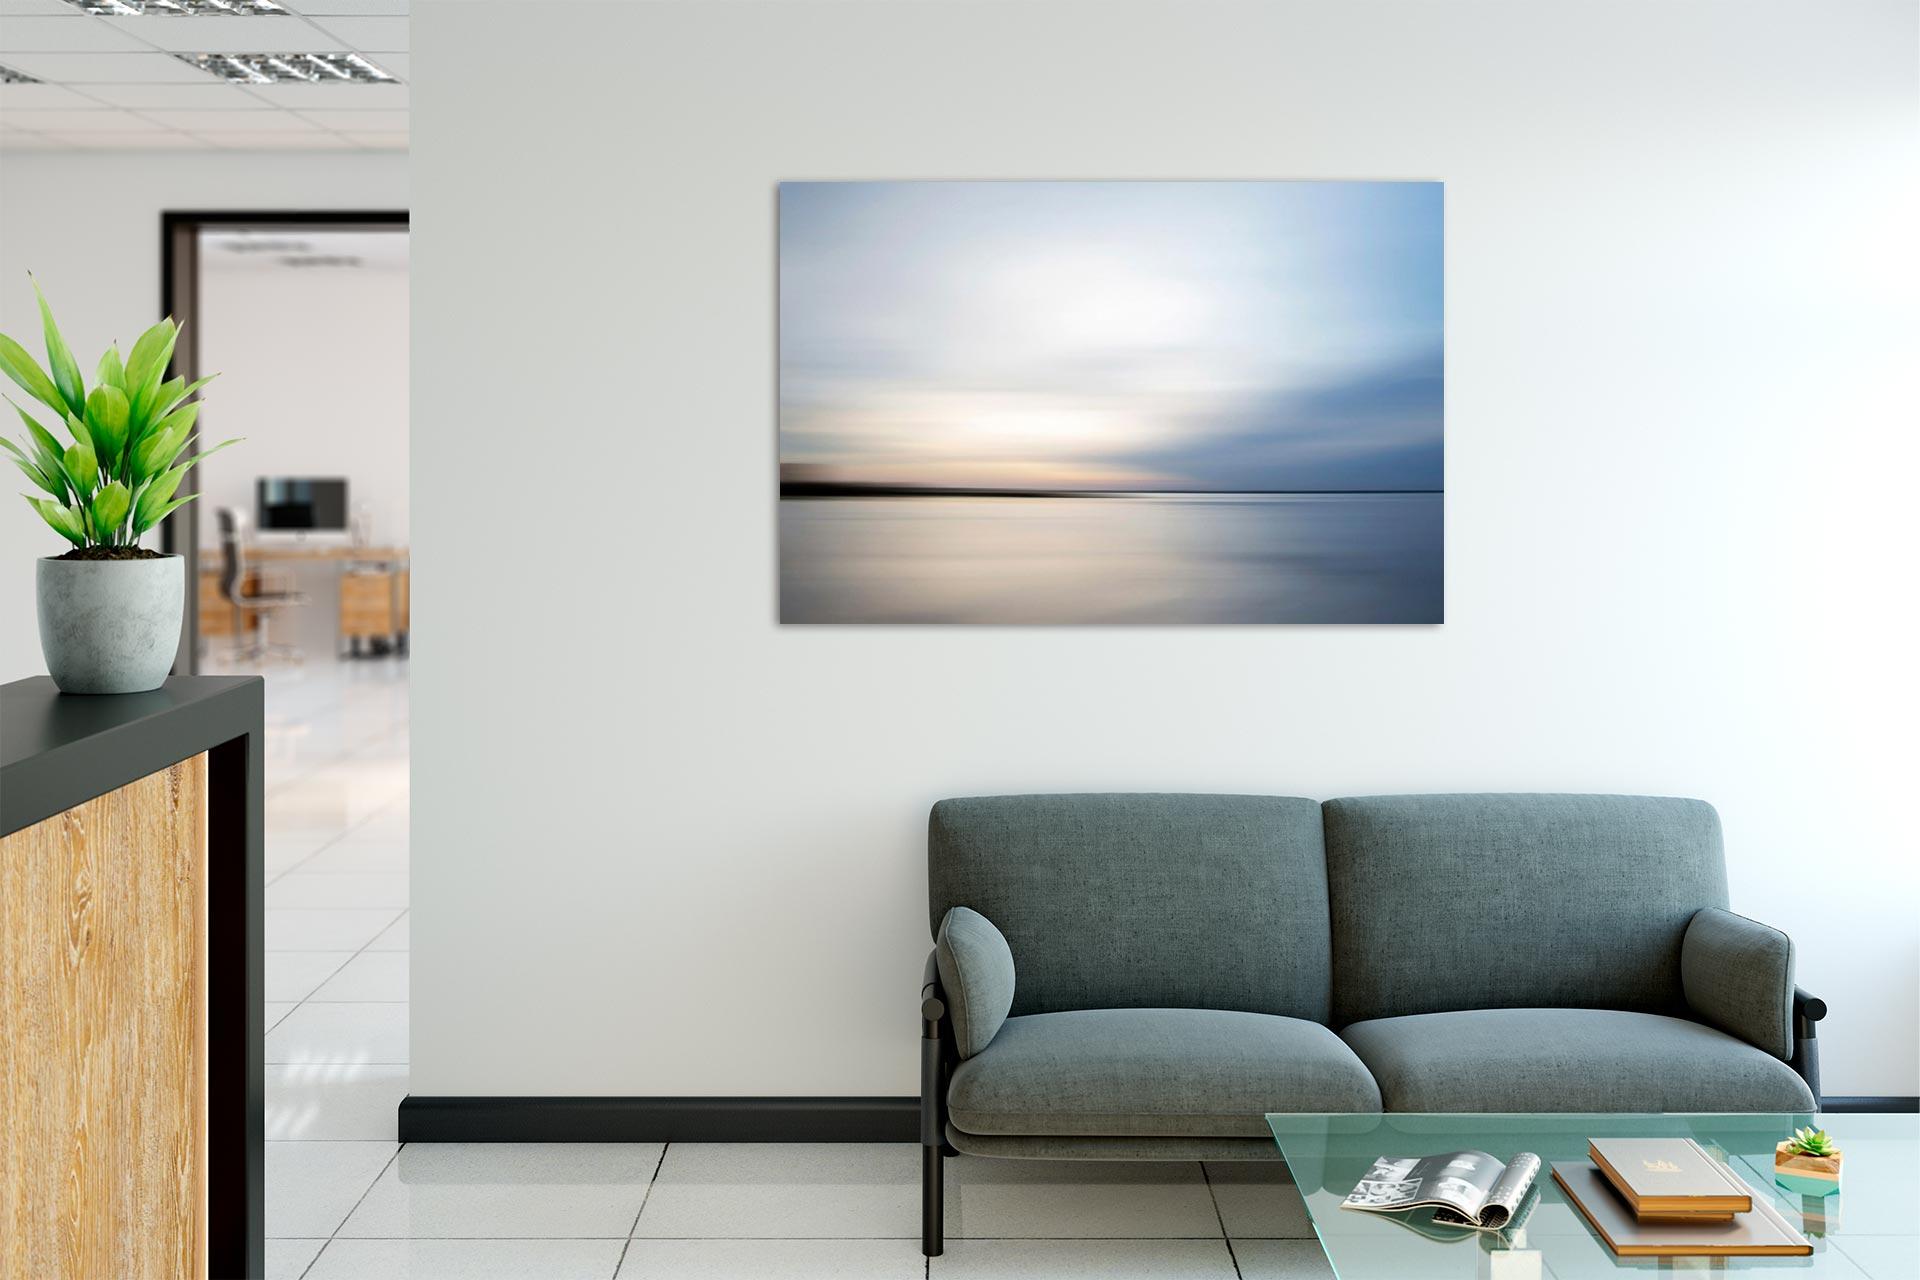 LCW202-drueben-wandbild-bild-auf-leinwand-acrylglas-aludibond-empfang